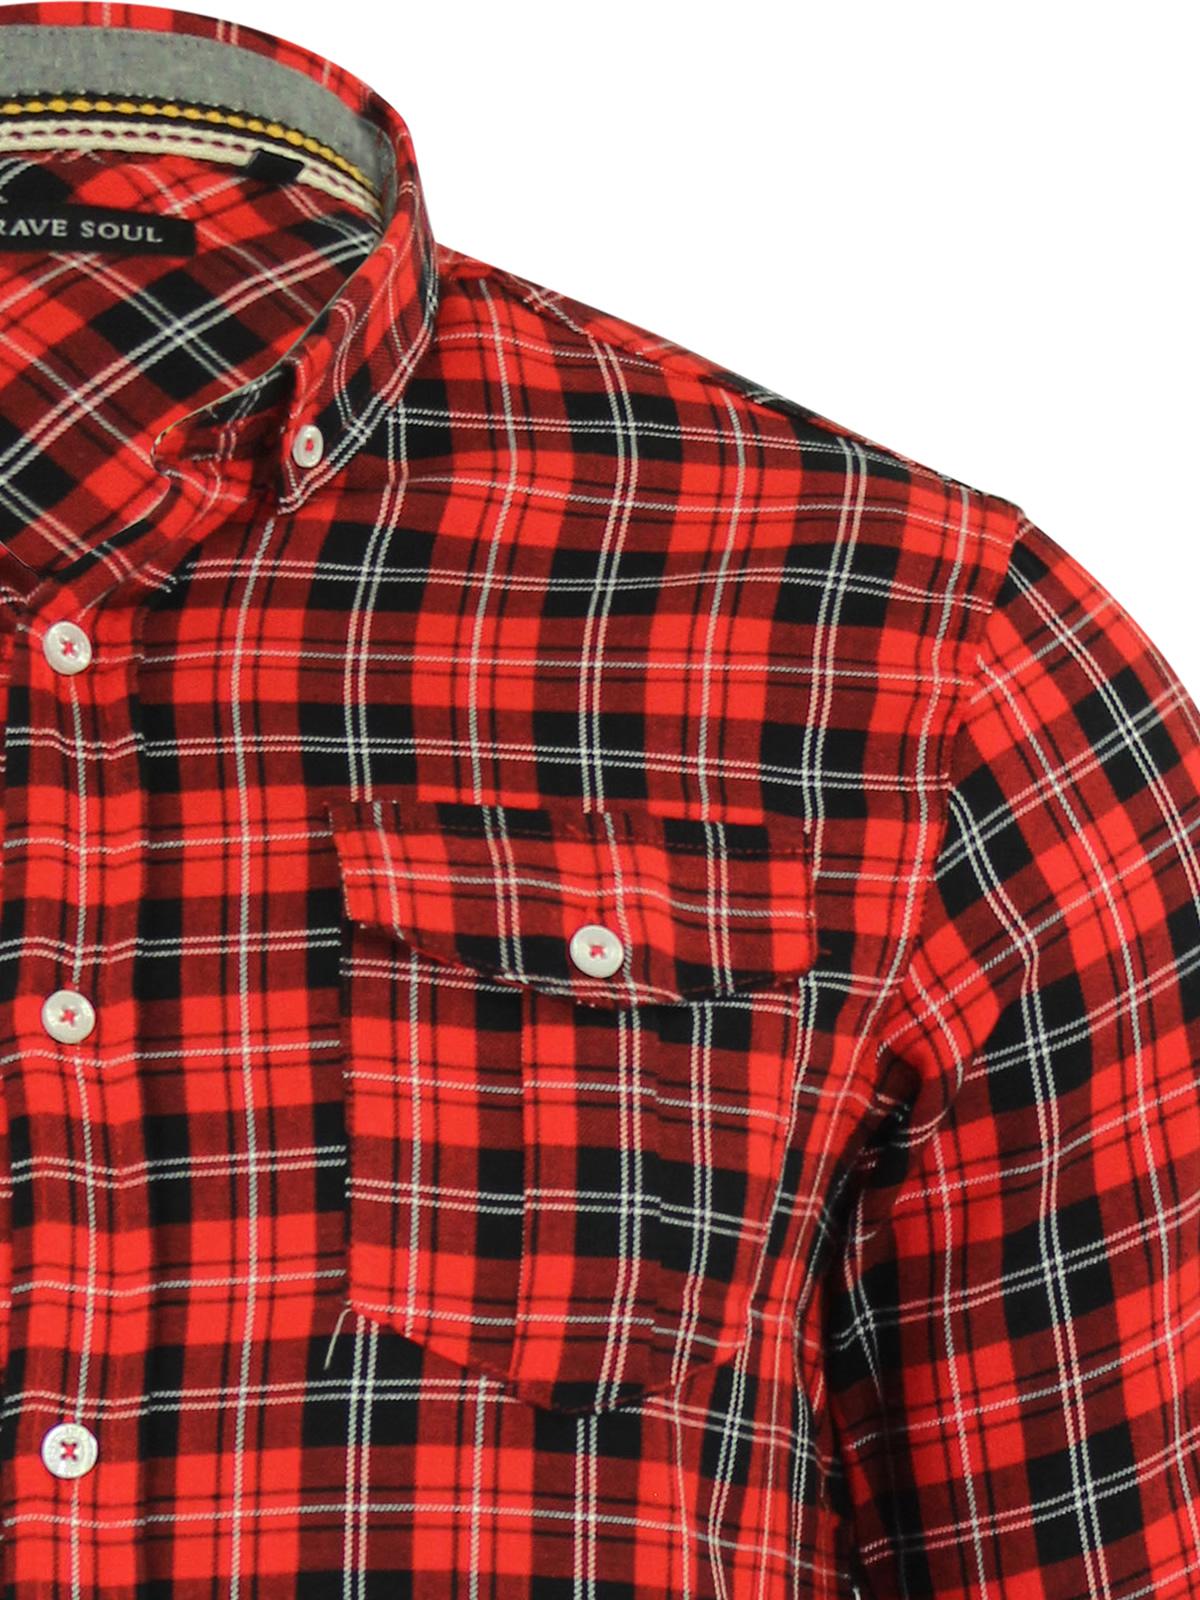 Mens check shirt brave soul cotton long sleeve casual top for Mens long sleeve casual cotton shirts